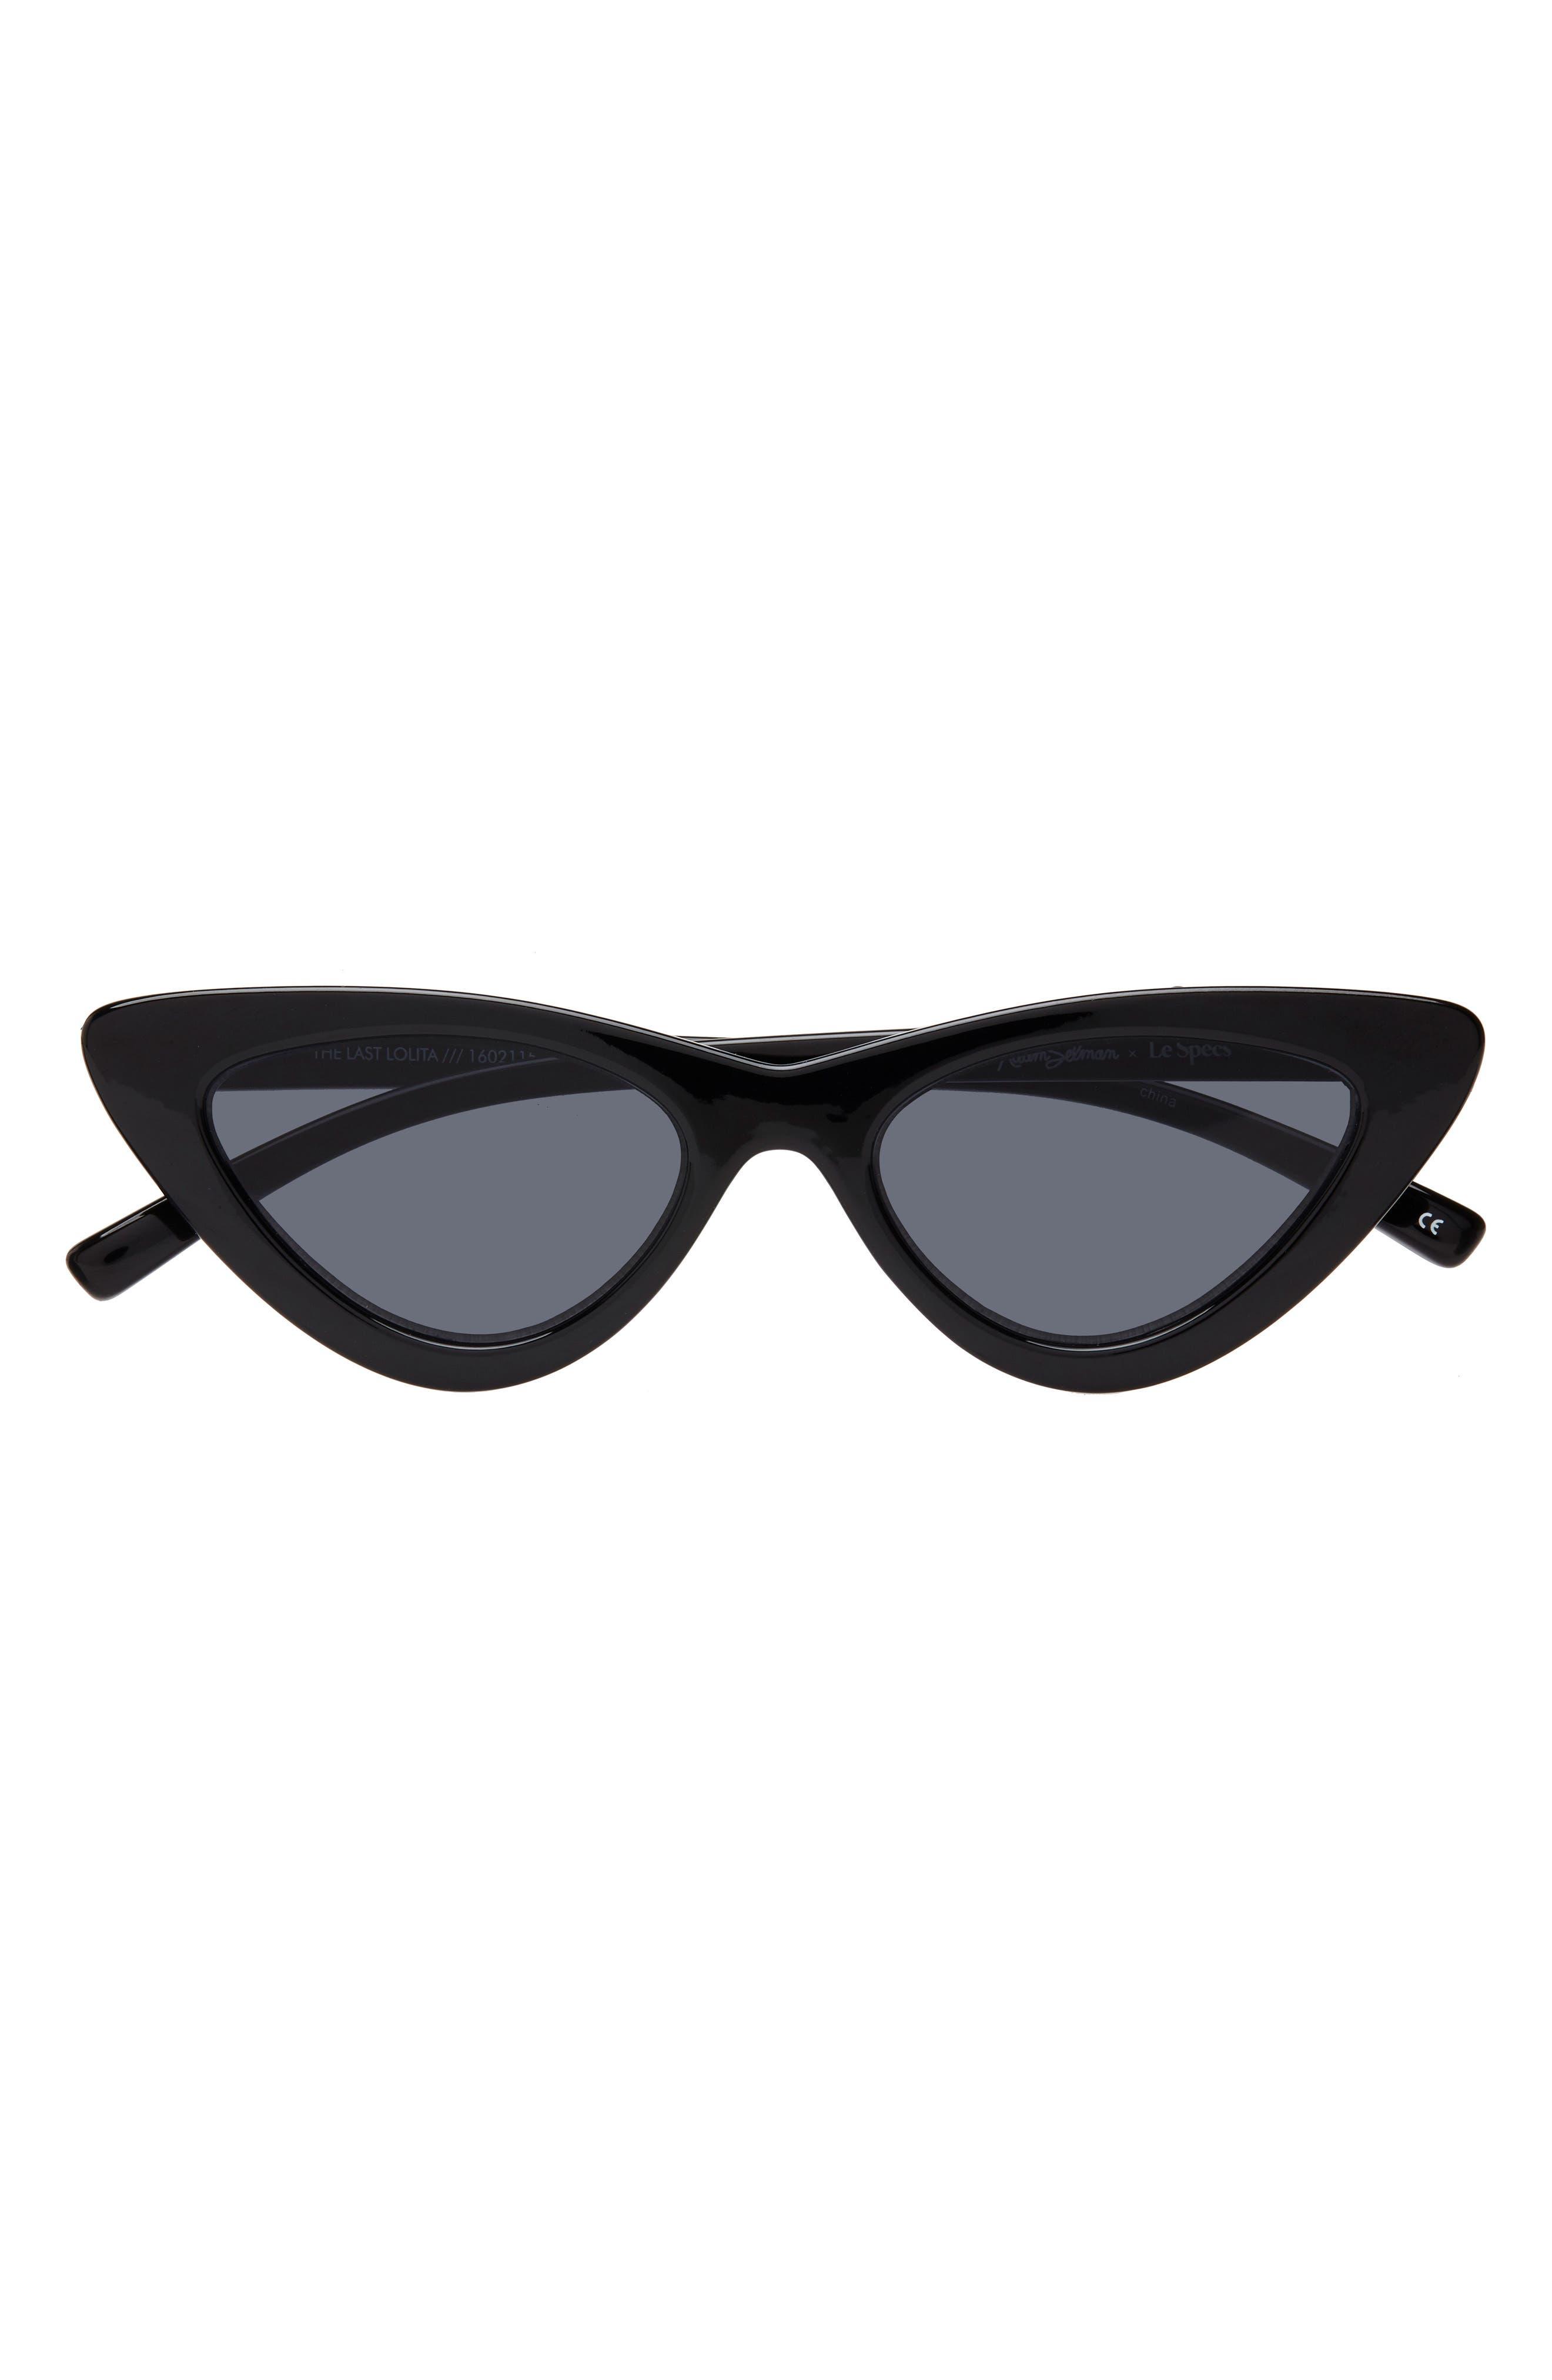 ADAM SELMAN X LE SPECS LUXE Lolita 49mm Cat Eye Sunglasses, Main, color, BLACK